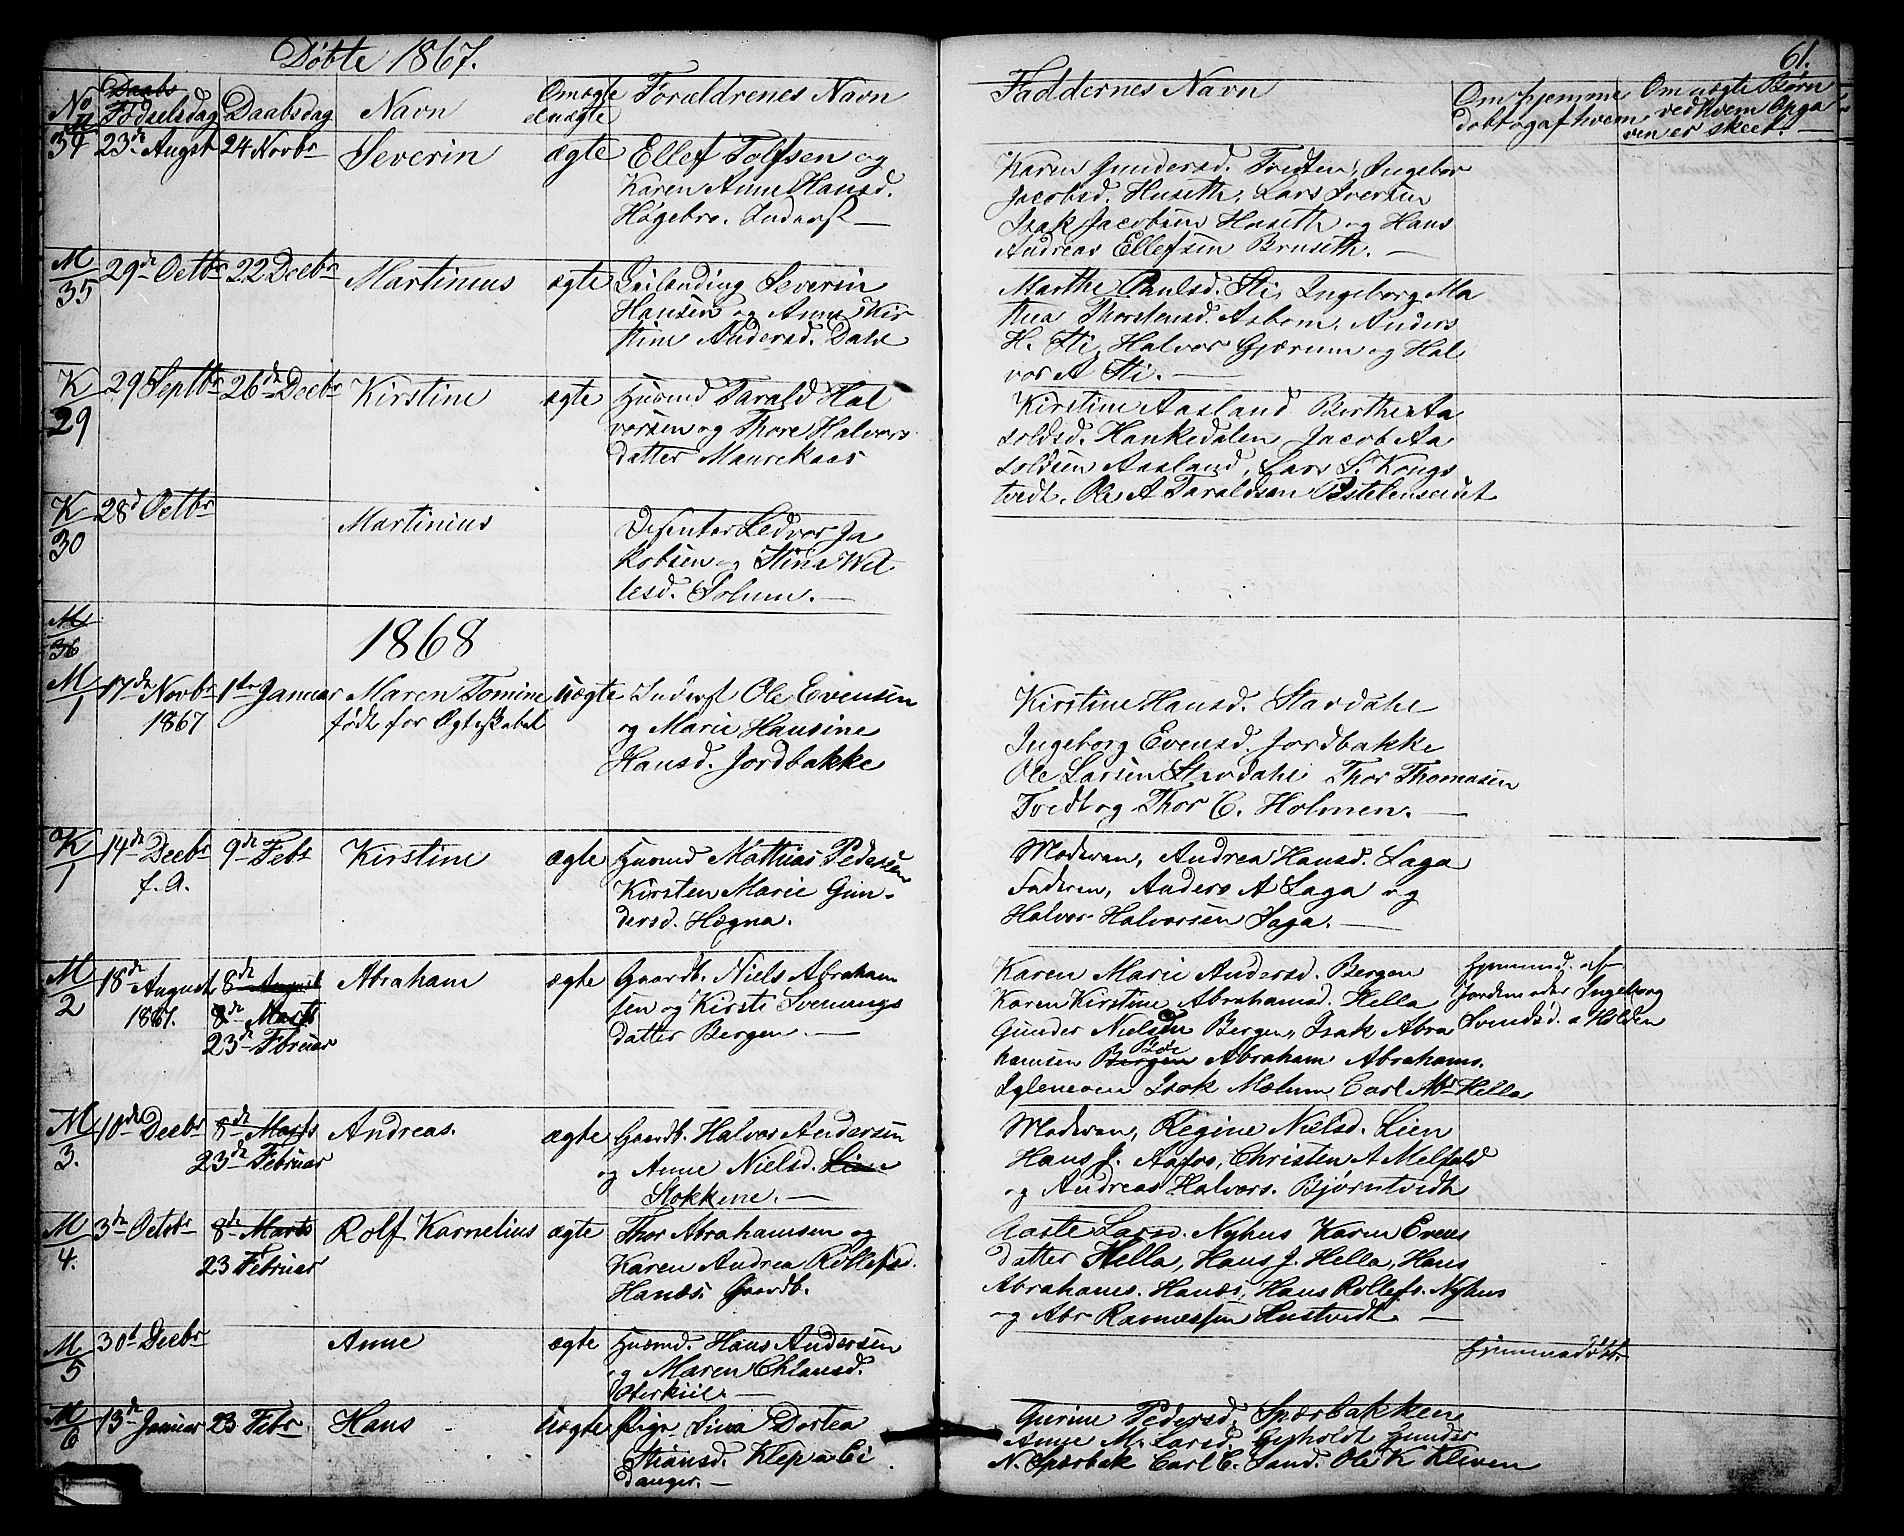 SAKO, Solum kirkebøker, G/Gb/L0002: Klokkerbok nr. II 2, 1859-1879, s. 61